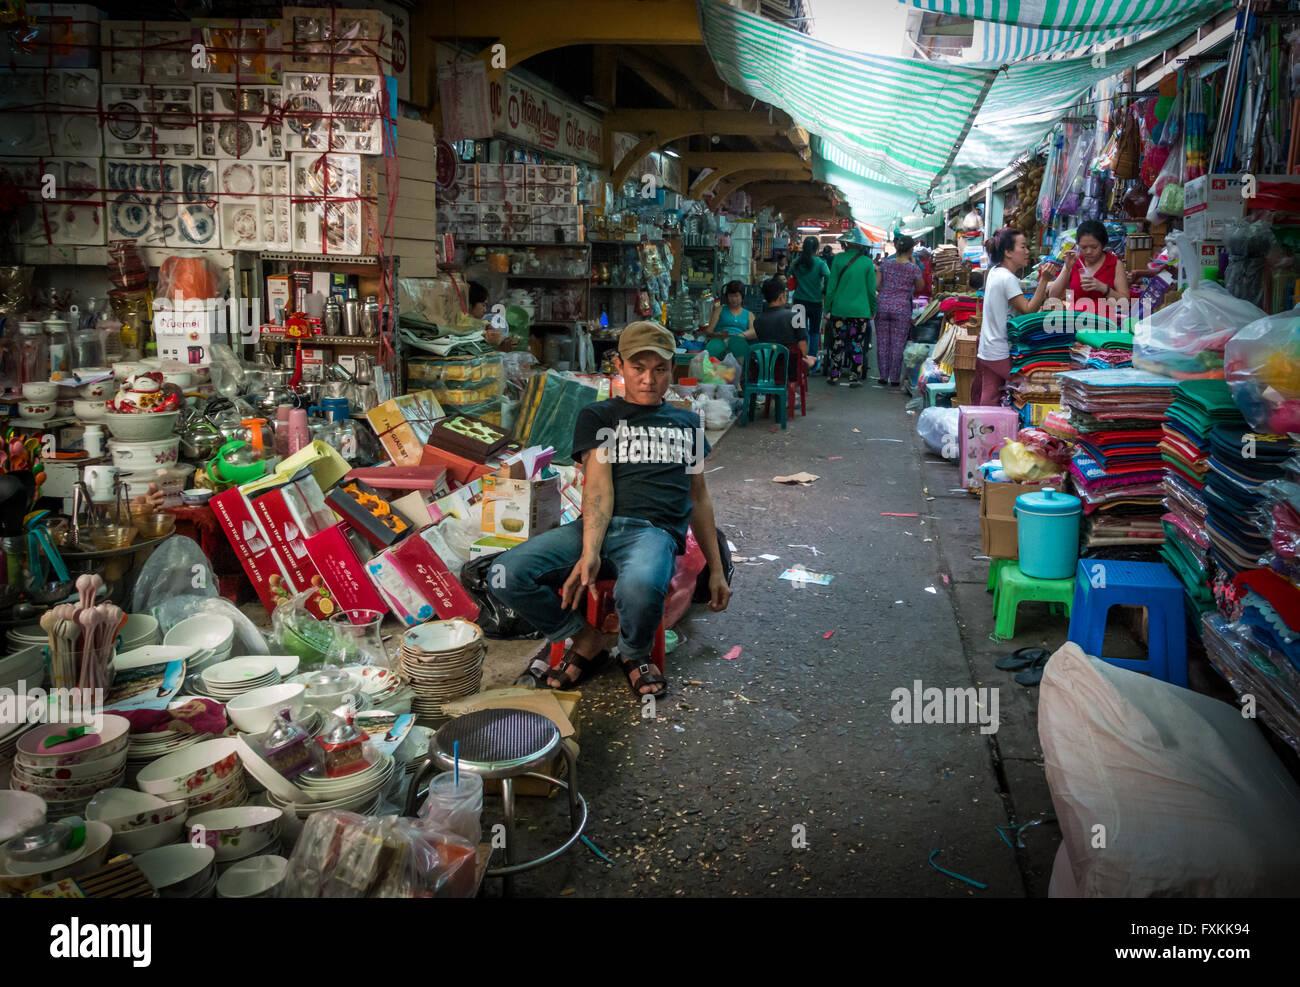 Inside Binh Tay Market, Ho Chi Minh City, Vietnam - Stock Image